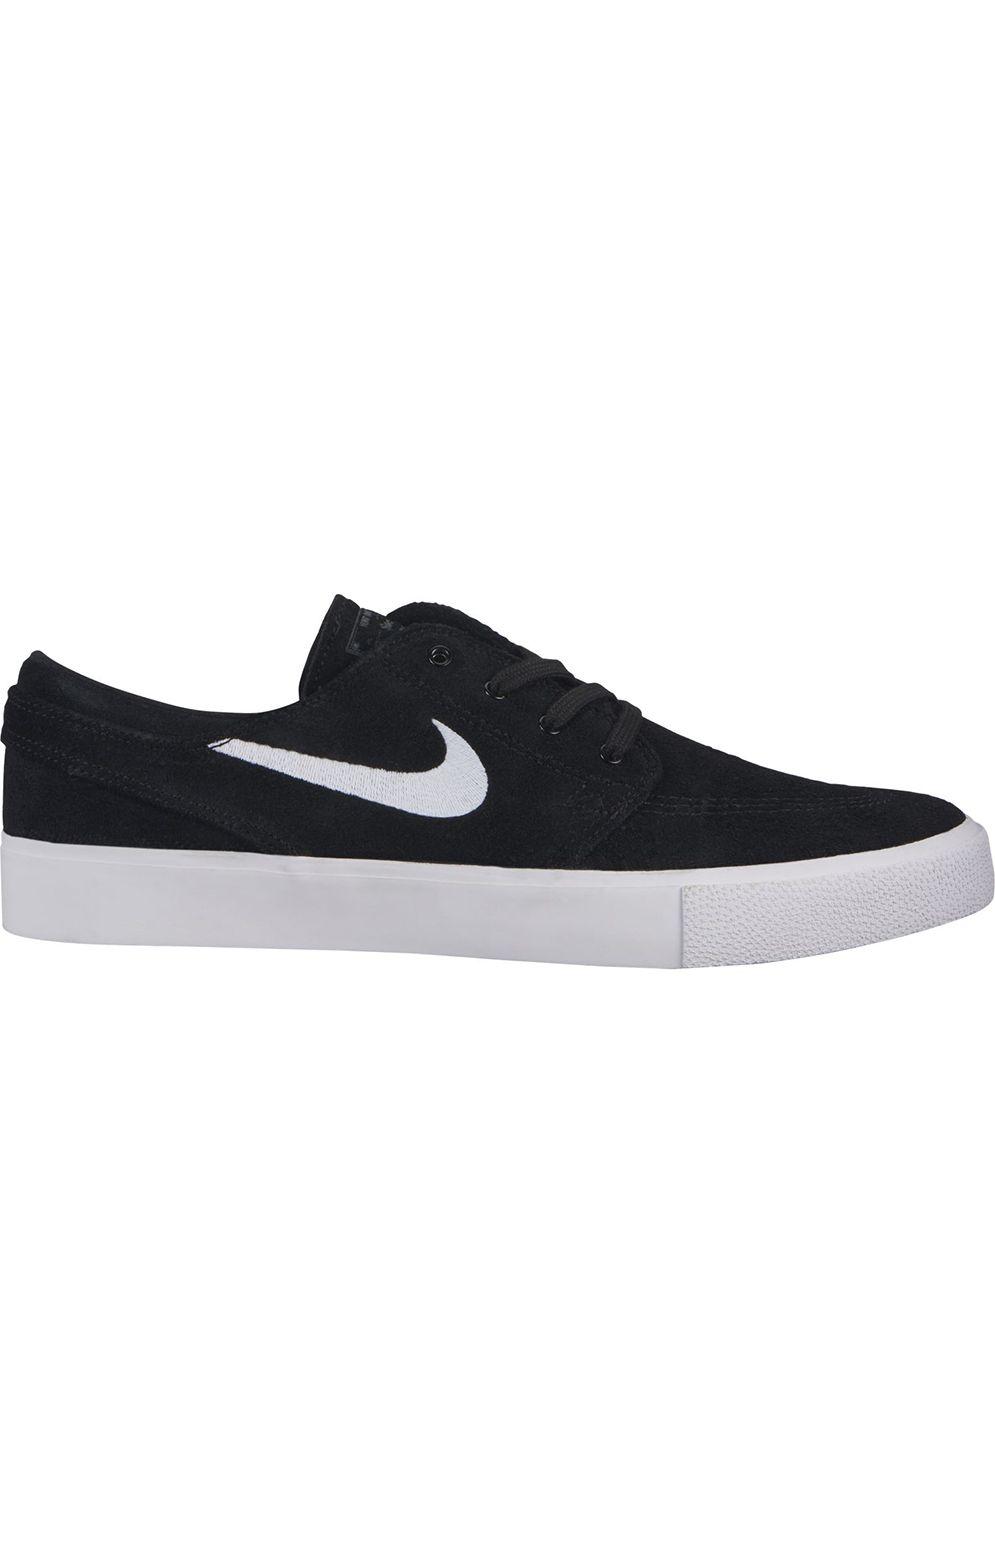 Nike Sb Shoes ZOOM STEFAN JANOSKI RM Black/White-Thunder Grey-Gum Light Brown